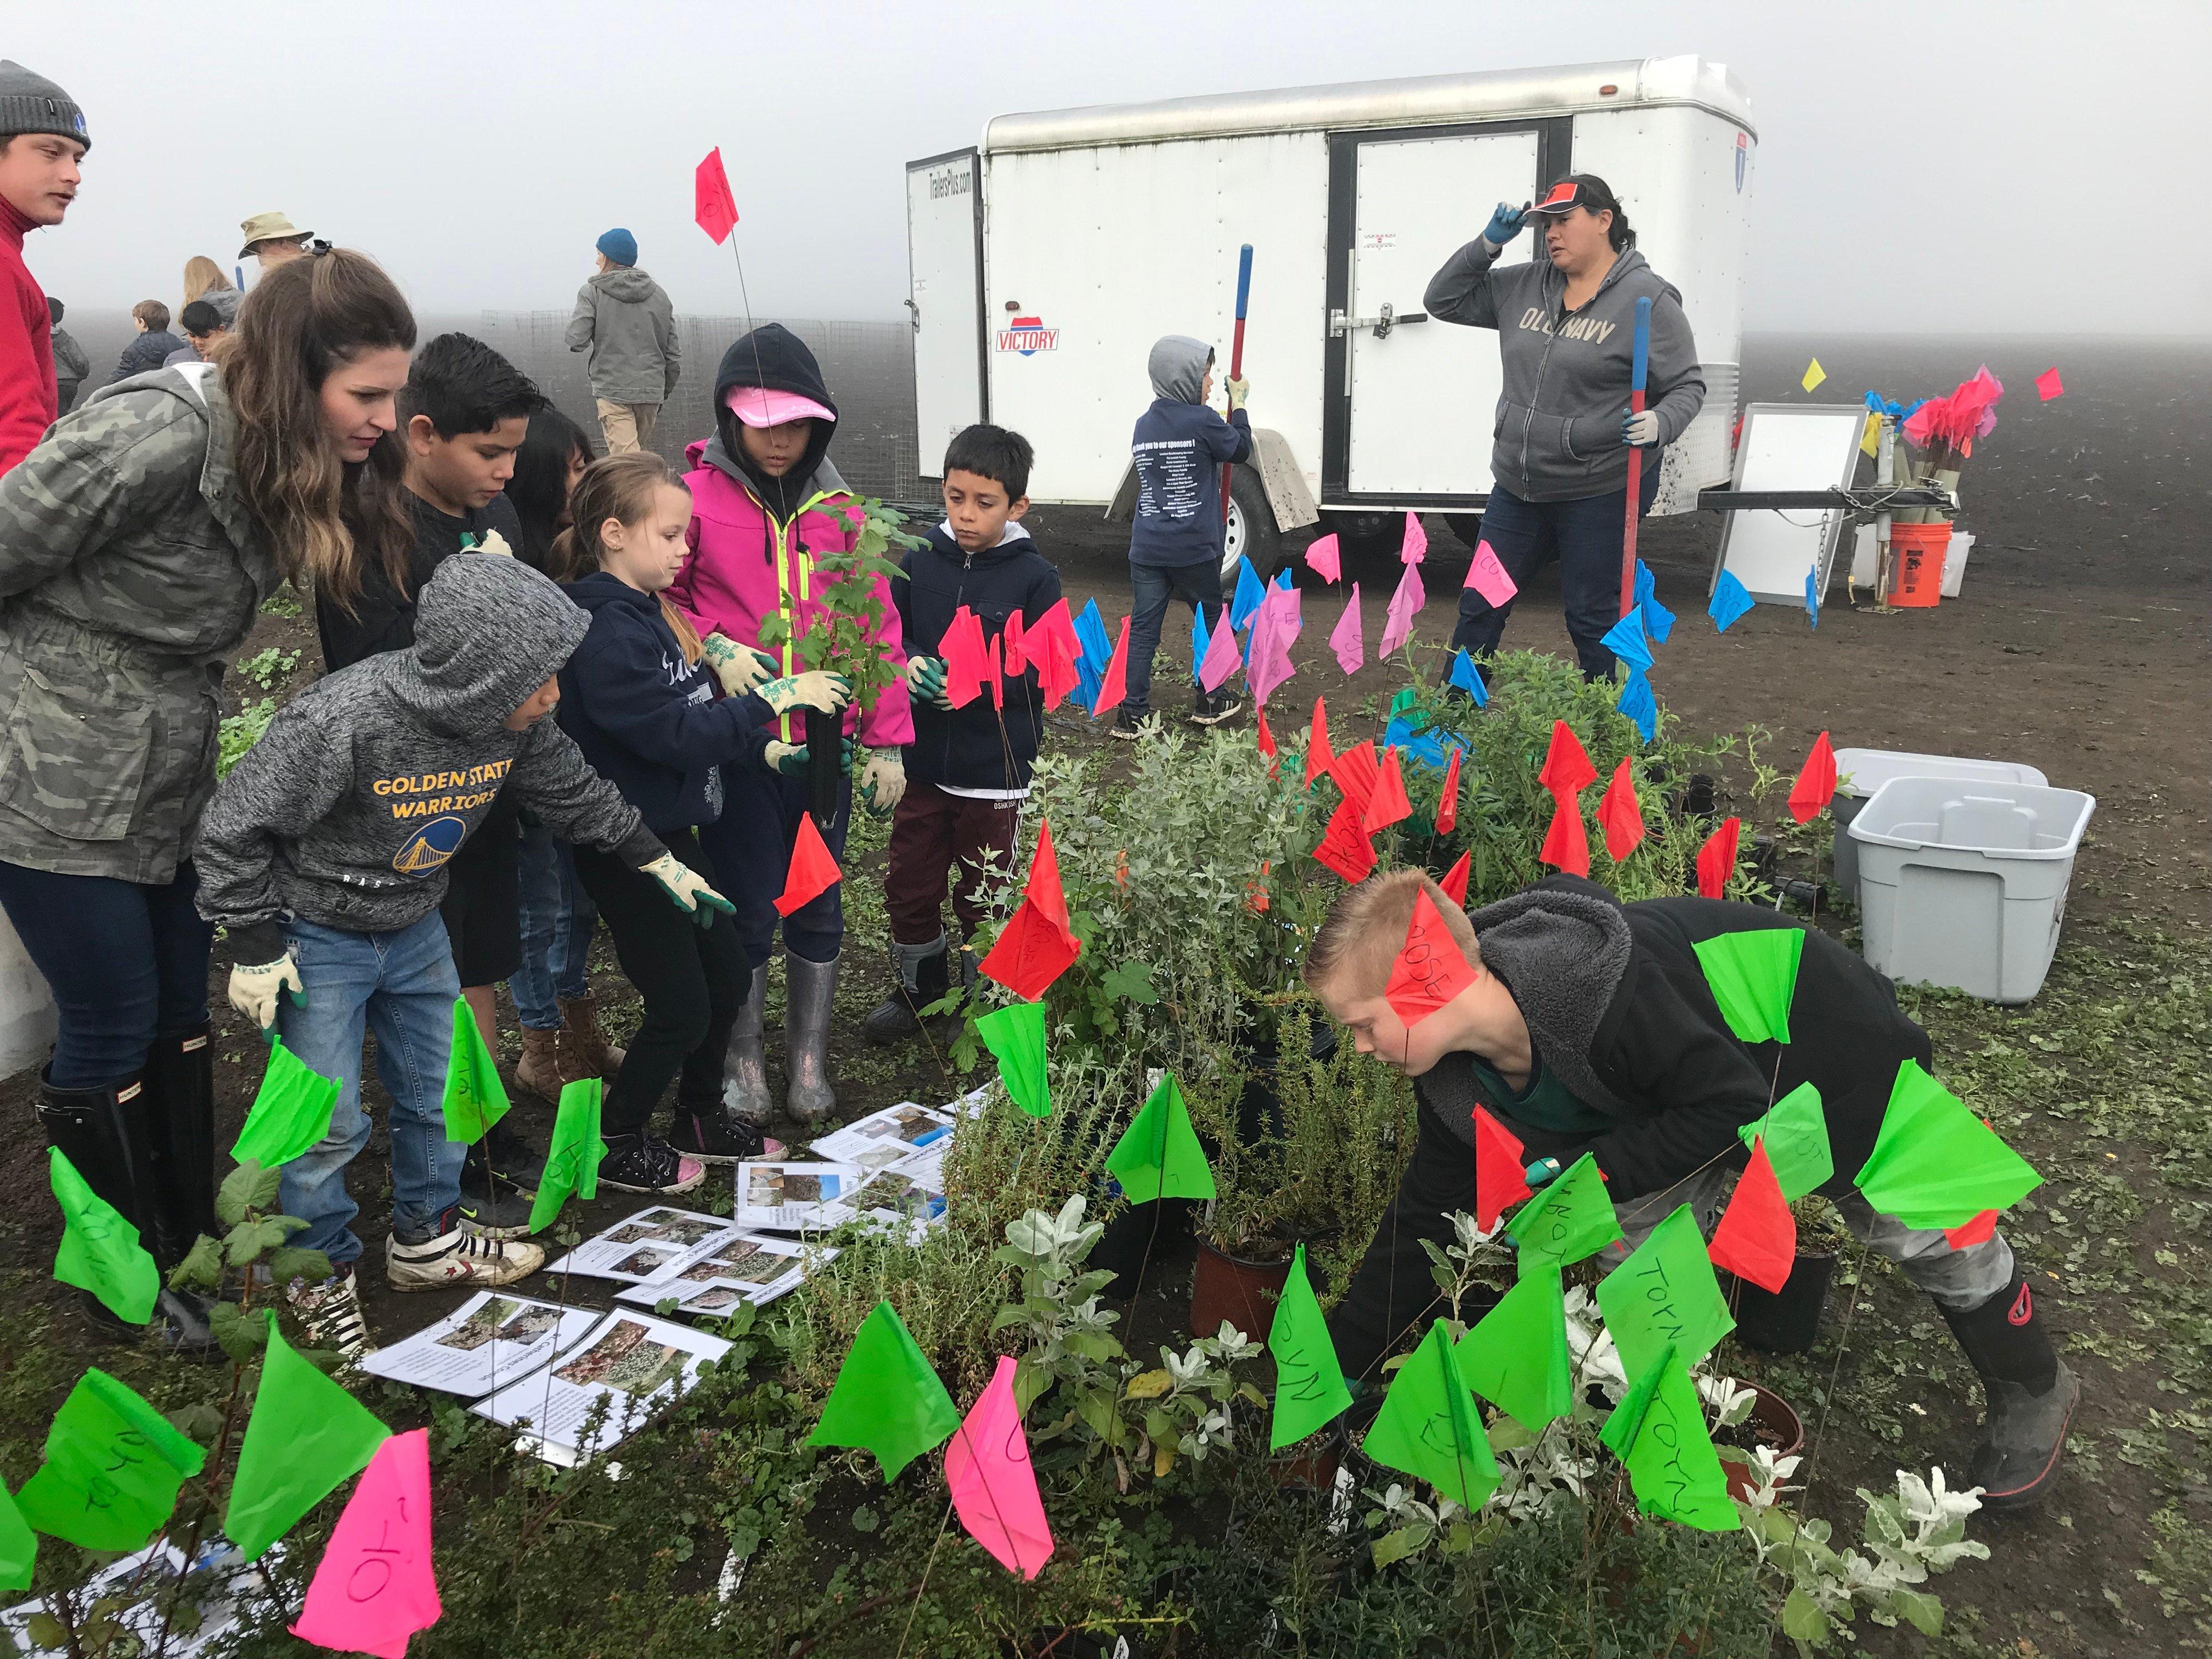 NPRAP - STRAW Hedgerow Planting - A.Pilon - 01-31-2020 - 34